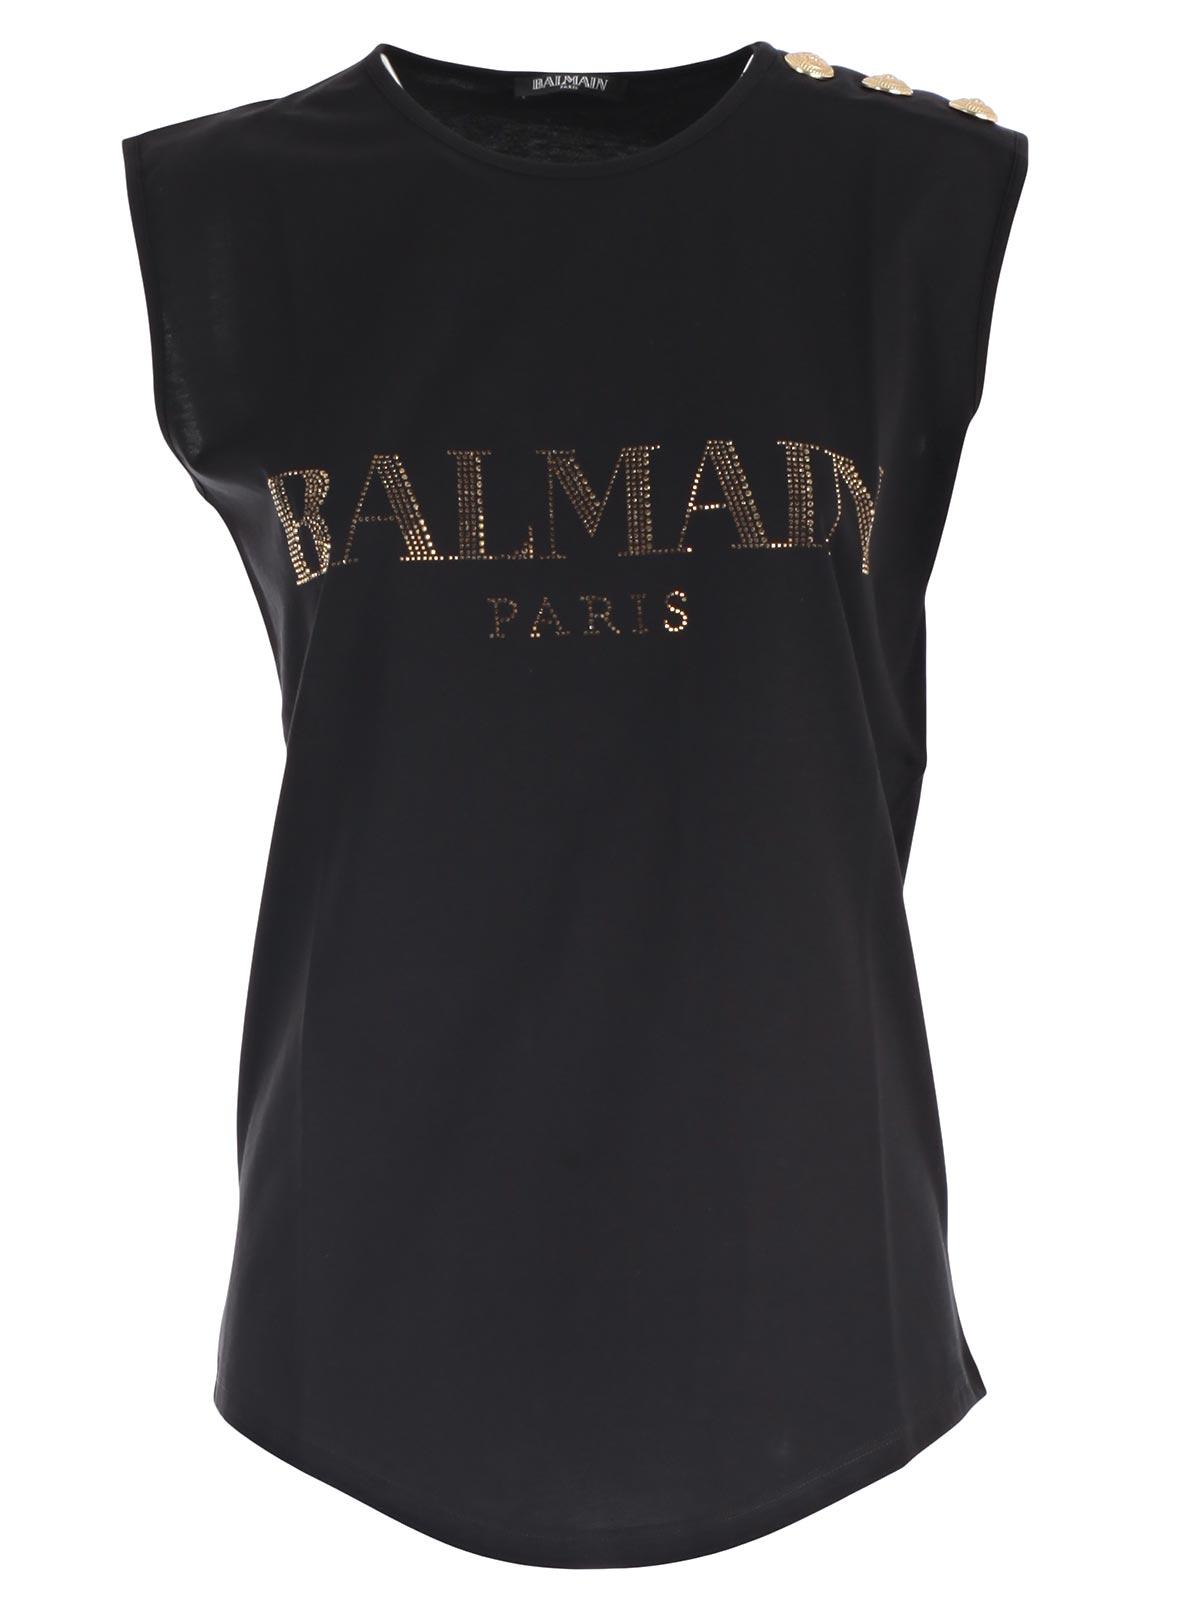 Picture of BALMAIN TOP